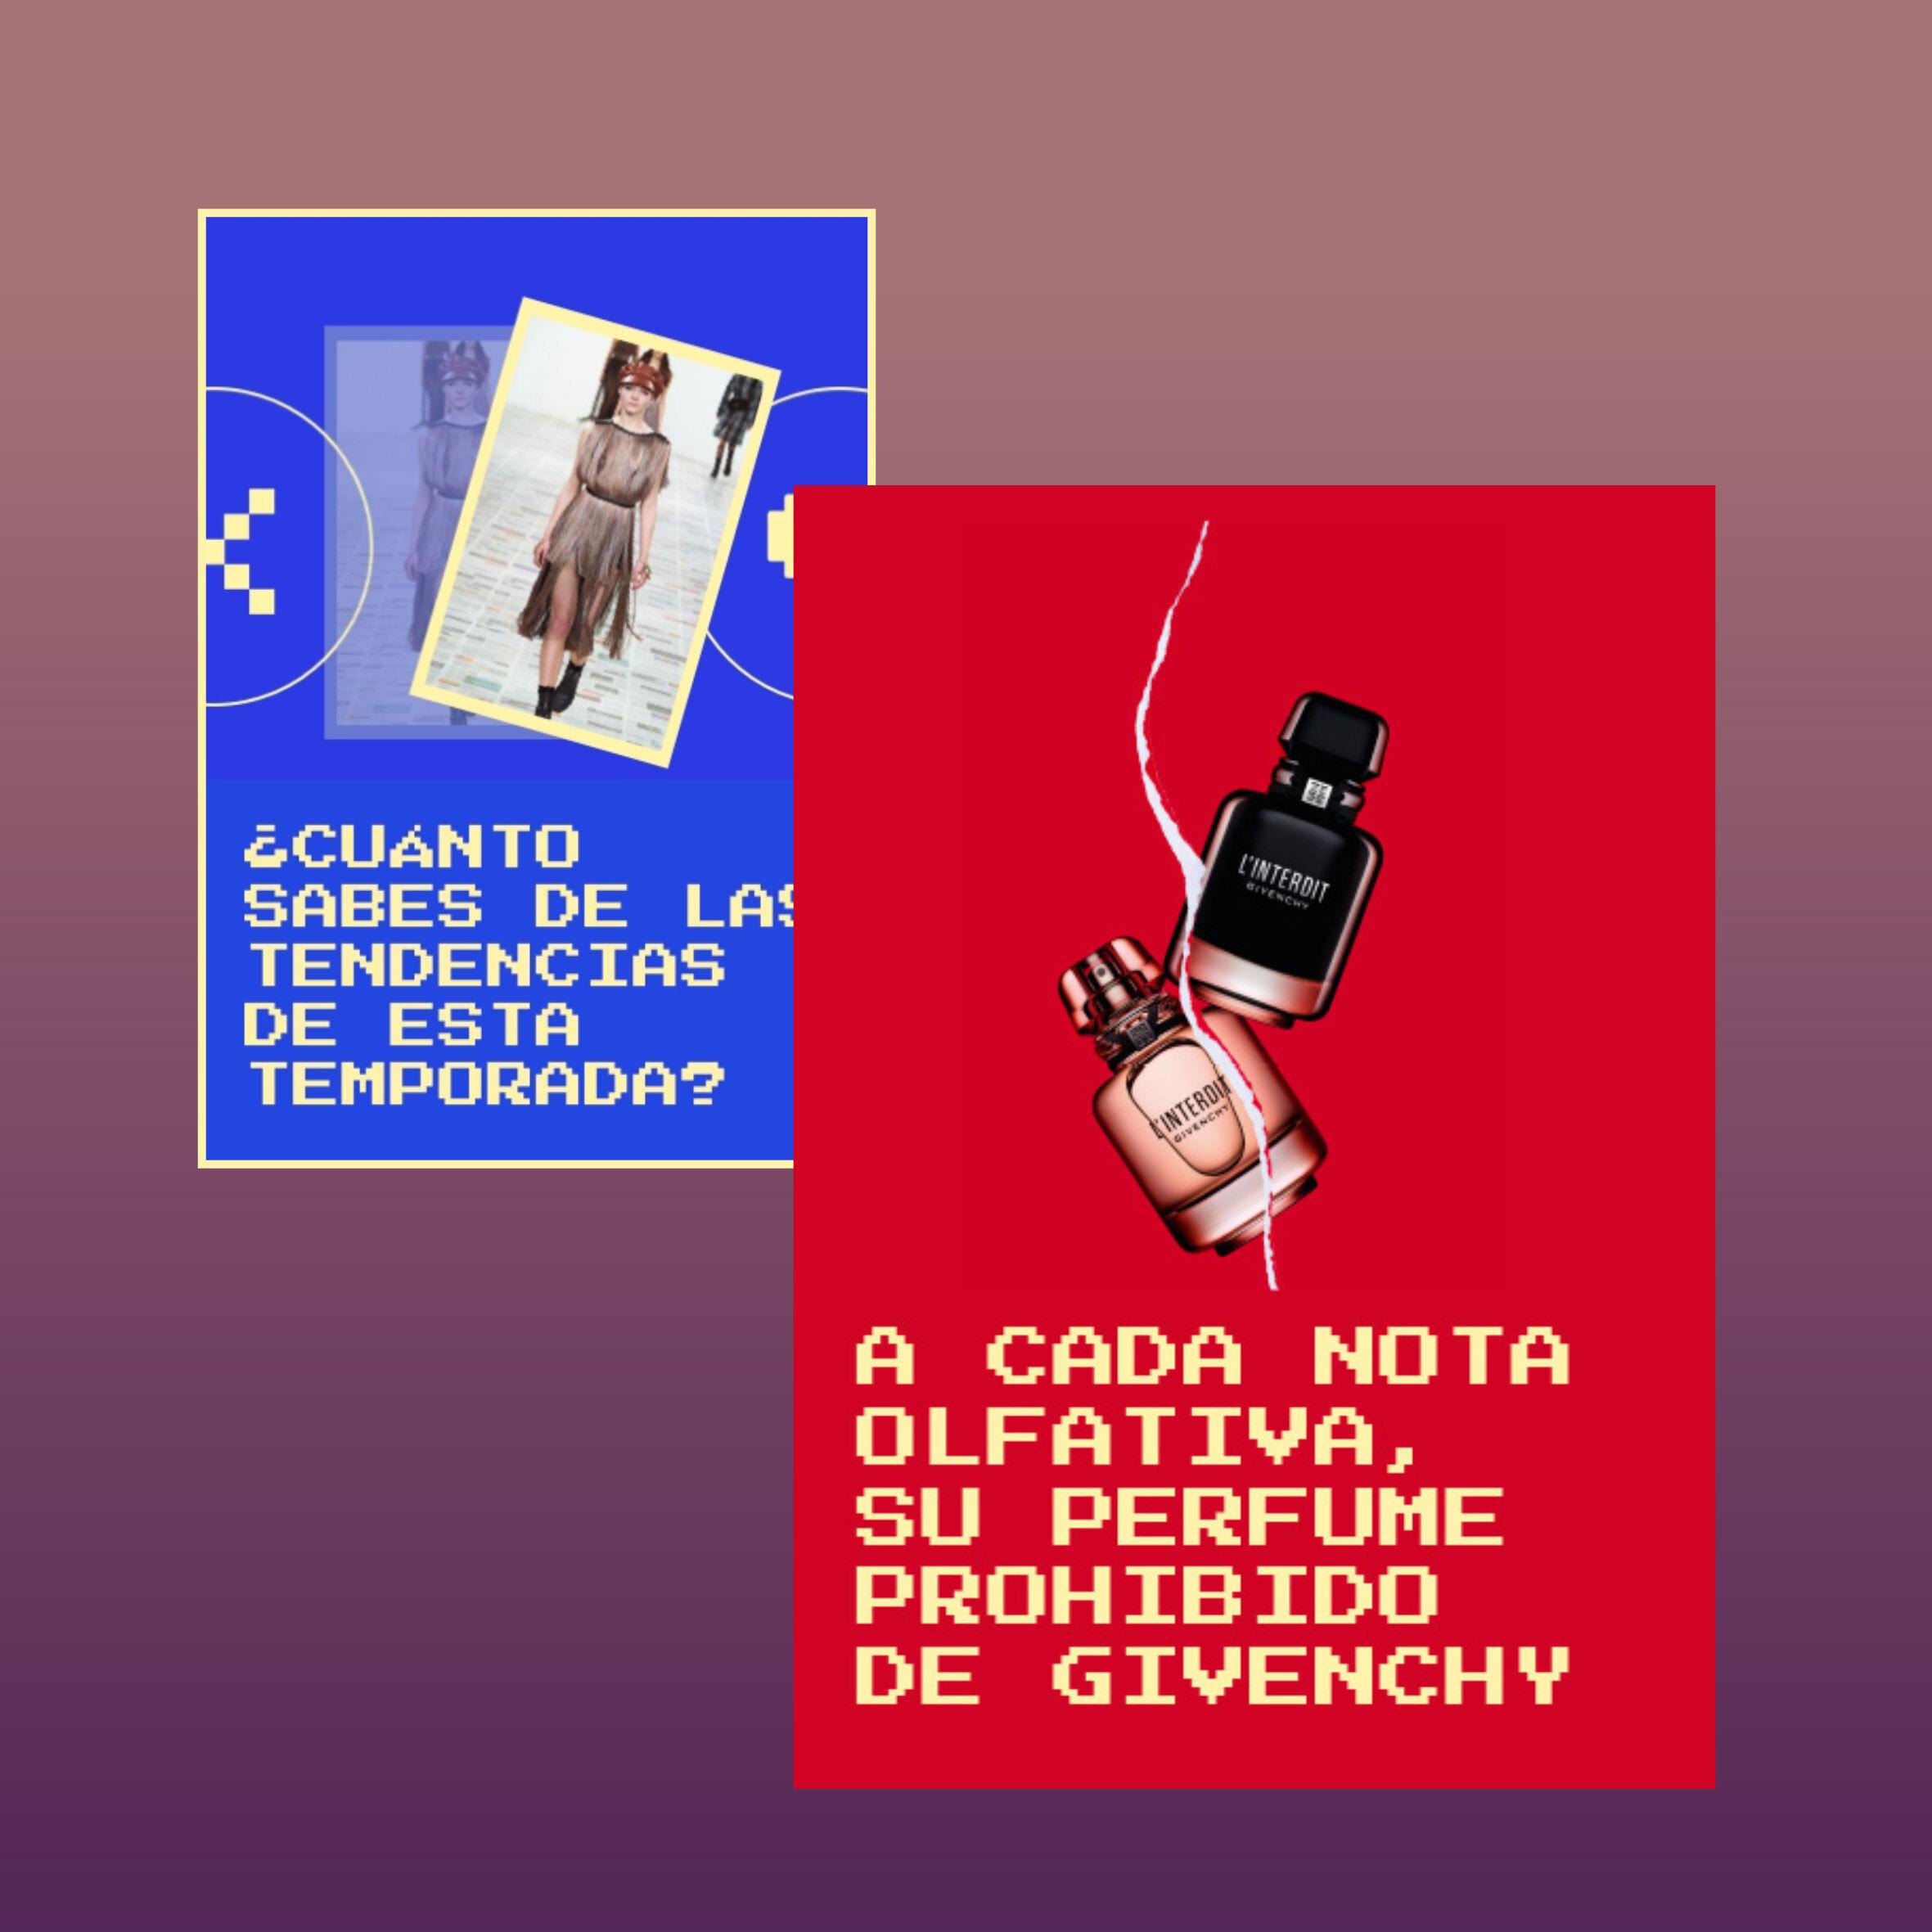 VFNI 04 - Spain - Vogue - Fashion's Night Out - Sponsor 3